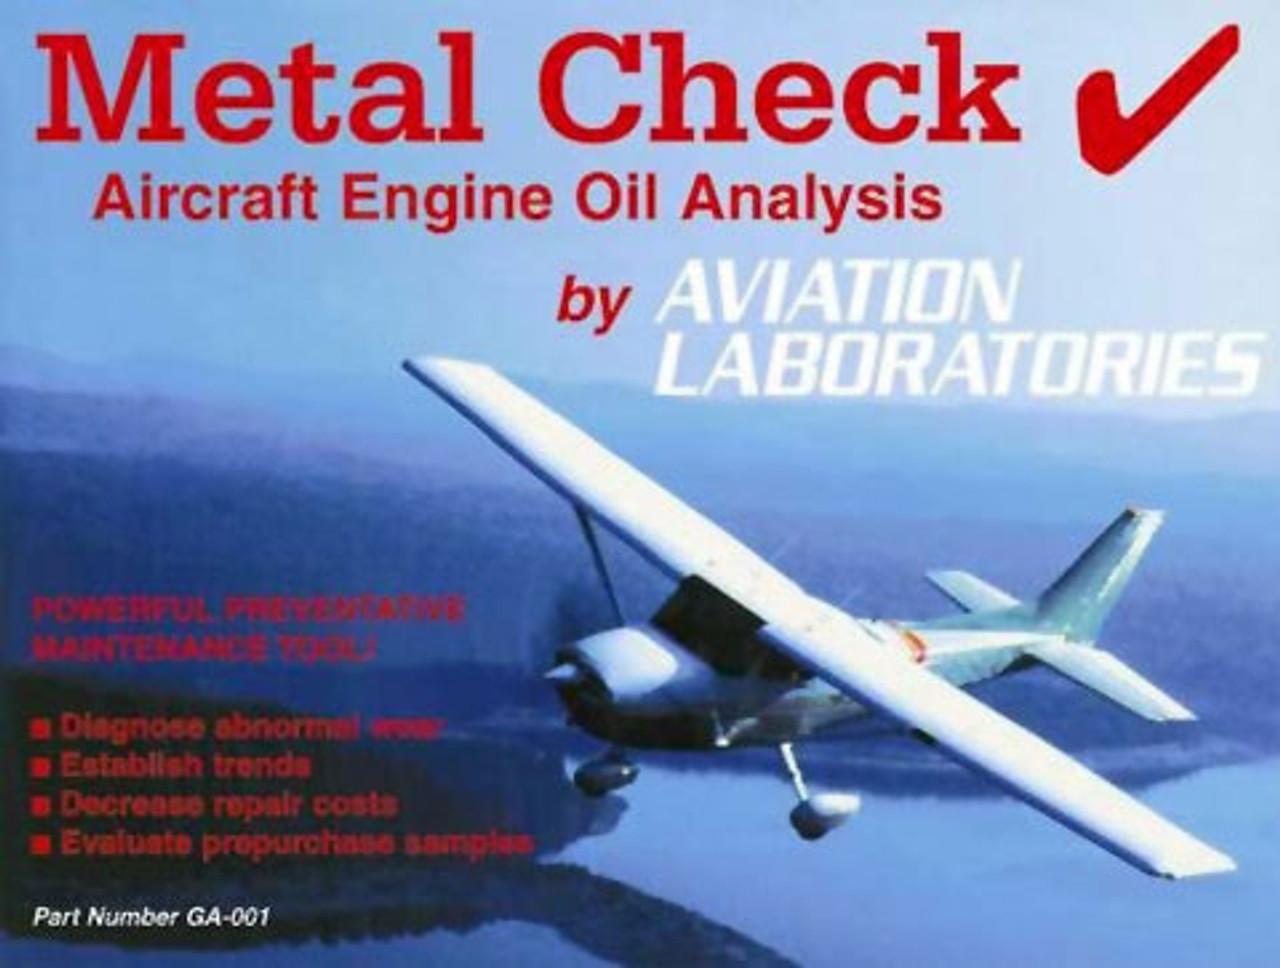 Aviation Laboratories Metal Check Oil Analysis Test Kit